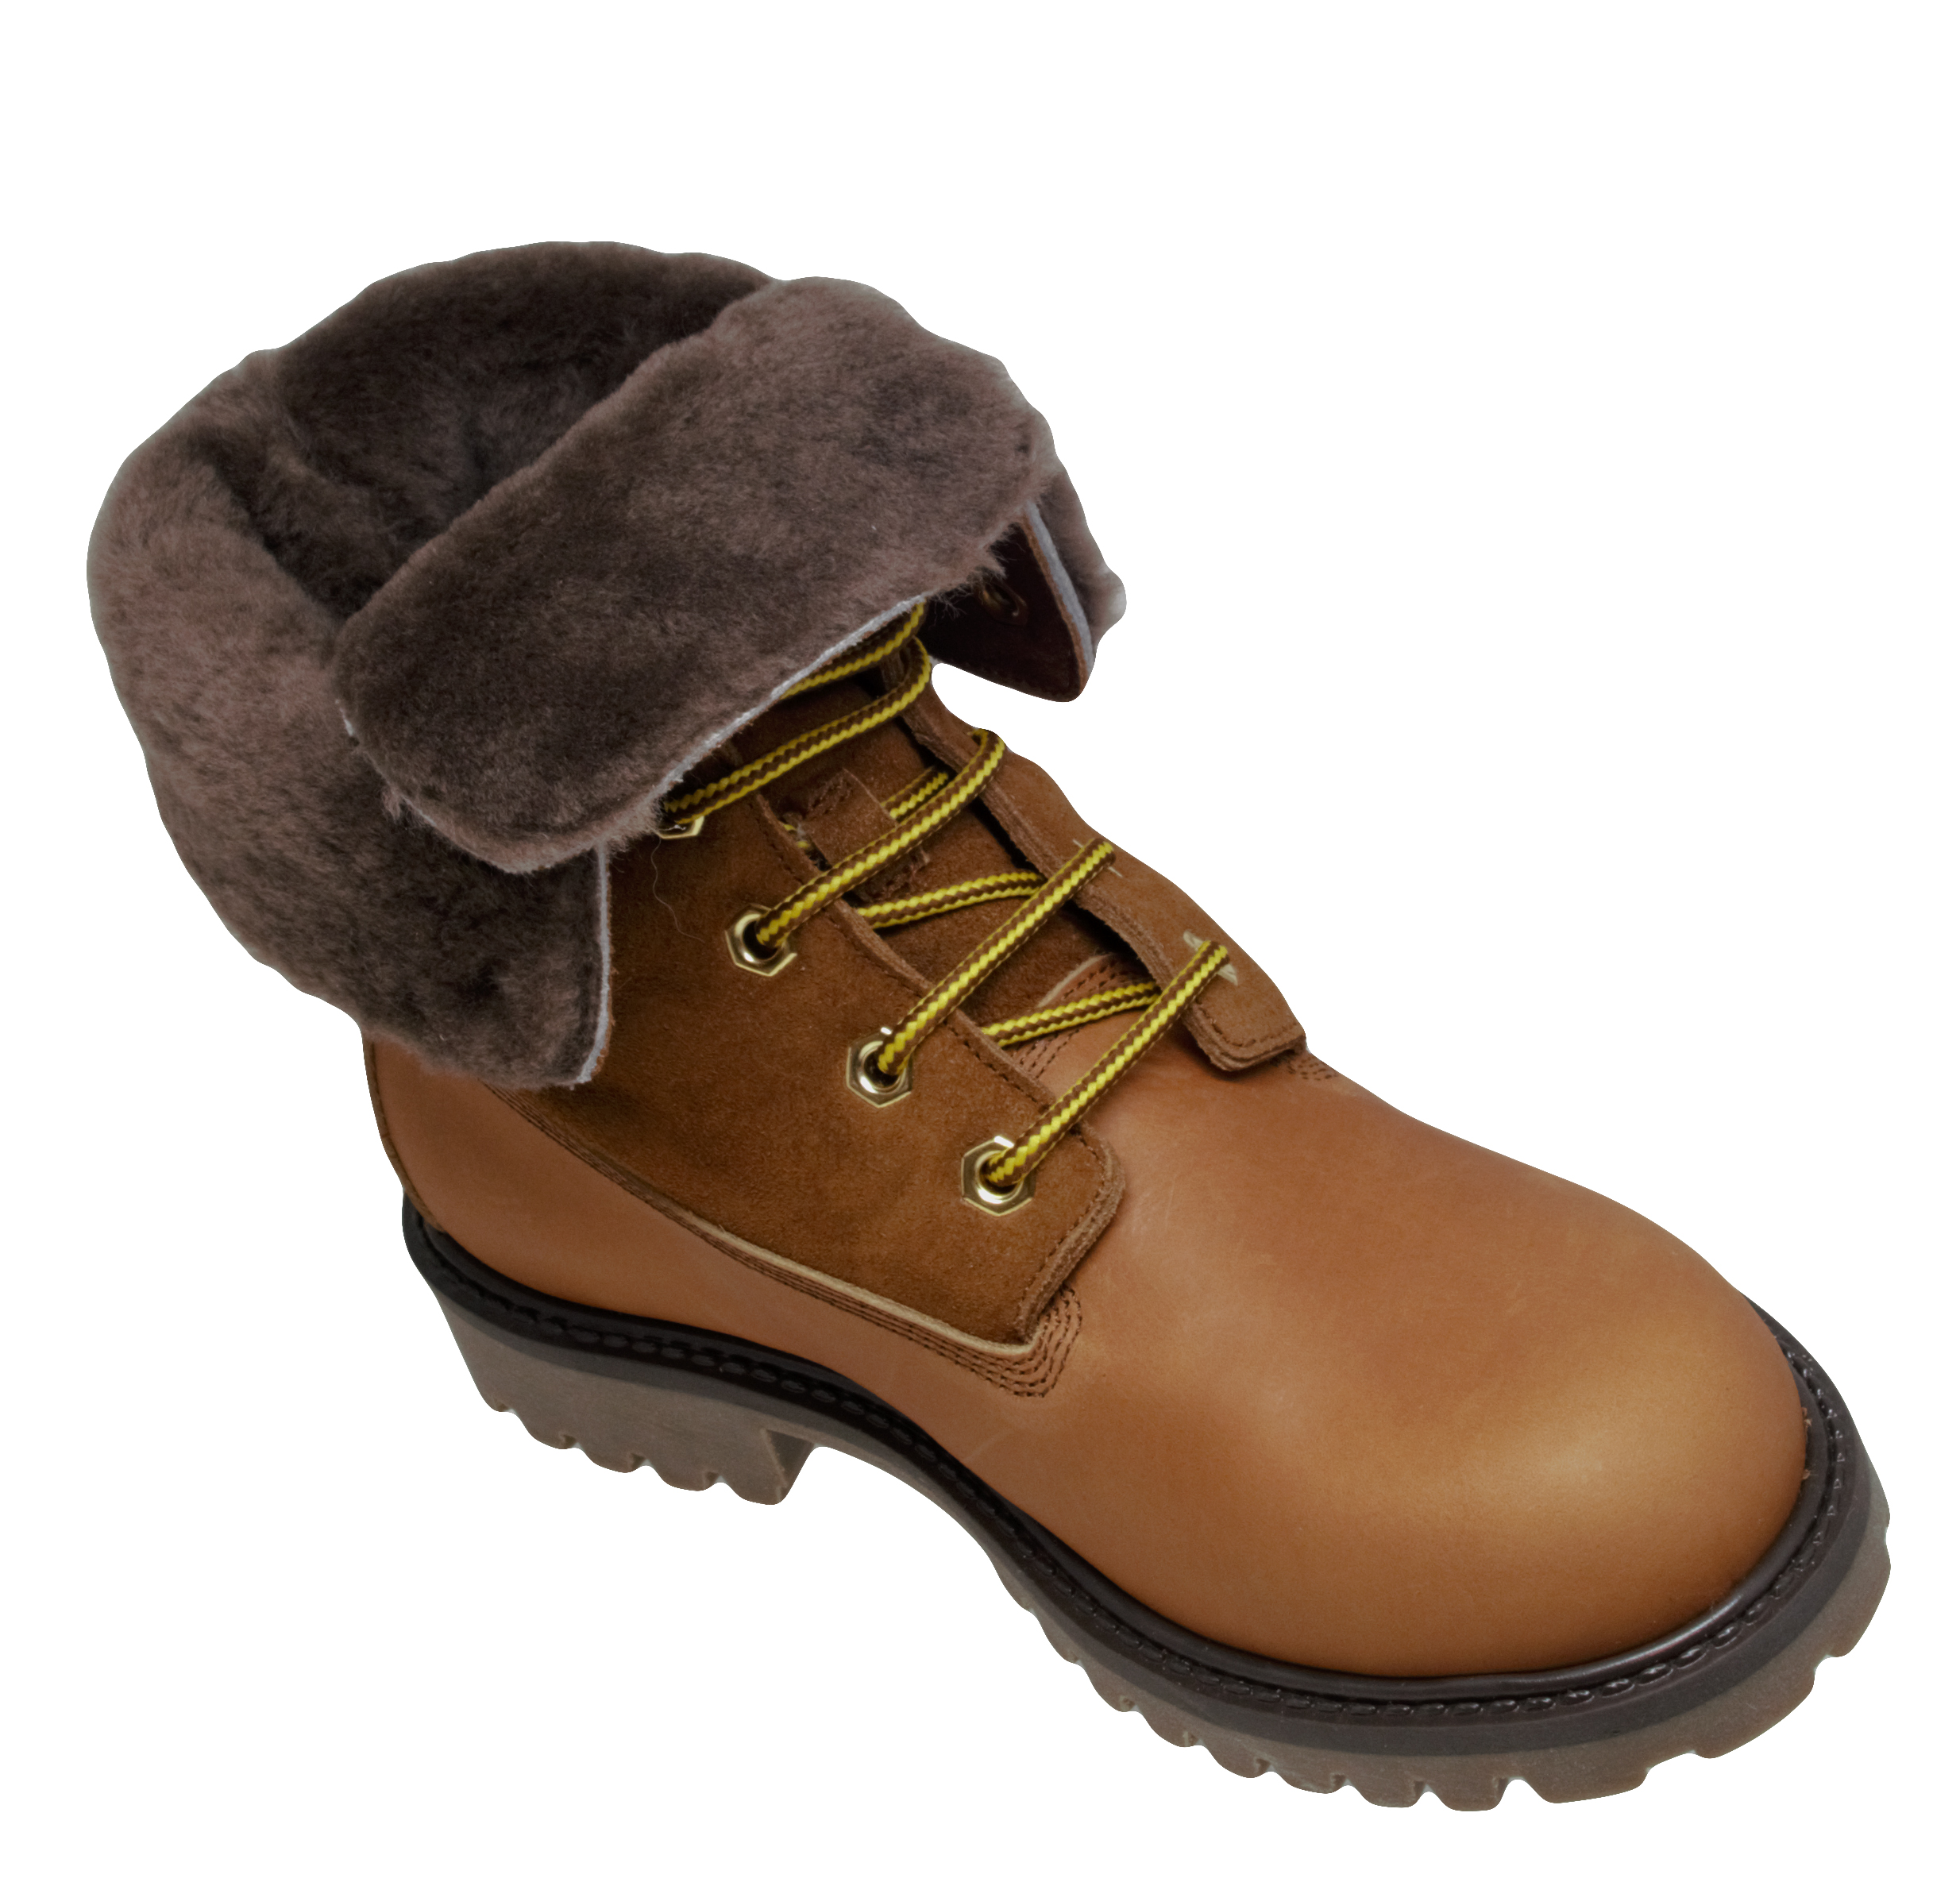 Gallucci 1077 Stiefel Schnürer Boots Leder Lammfell Braun Gr 34-41 Neu